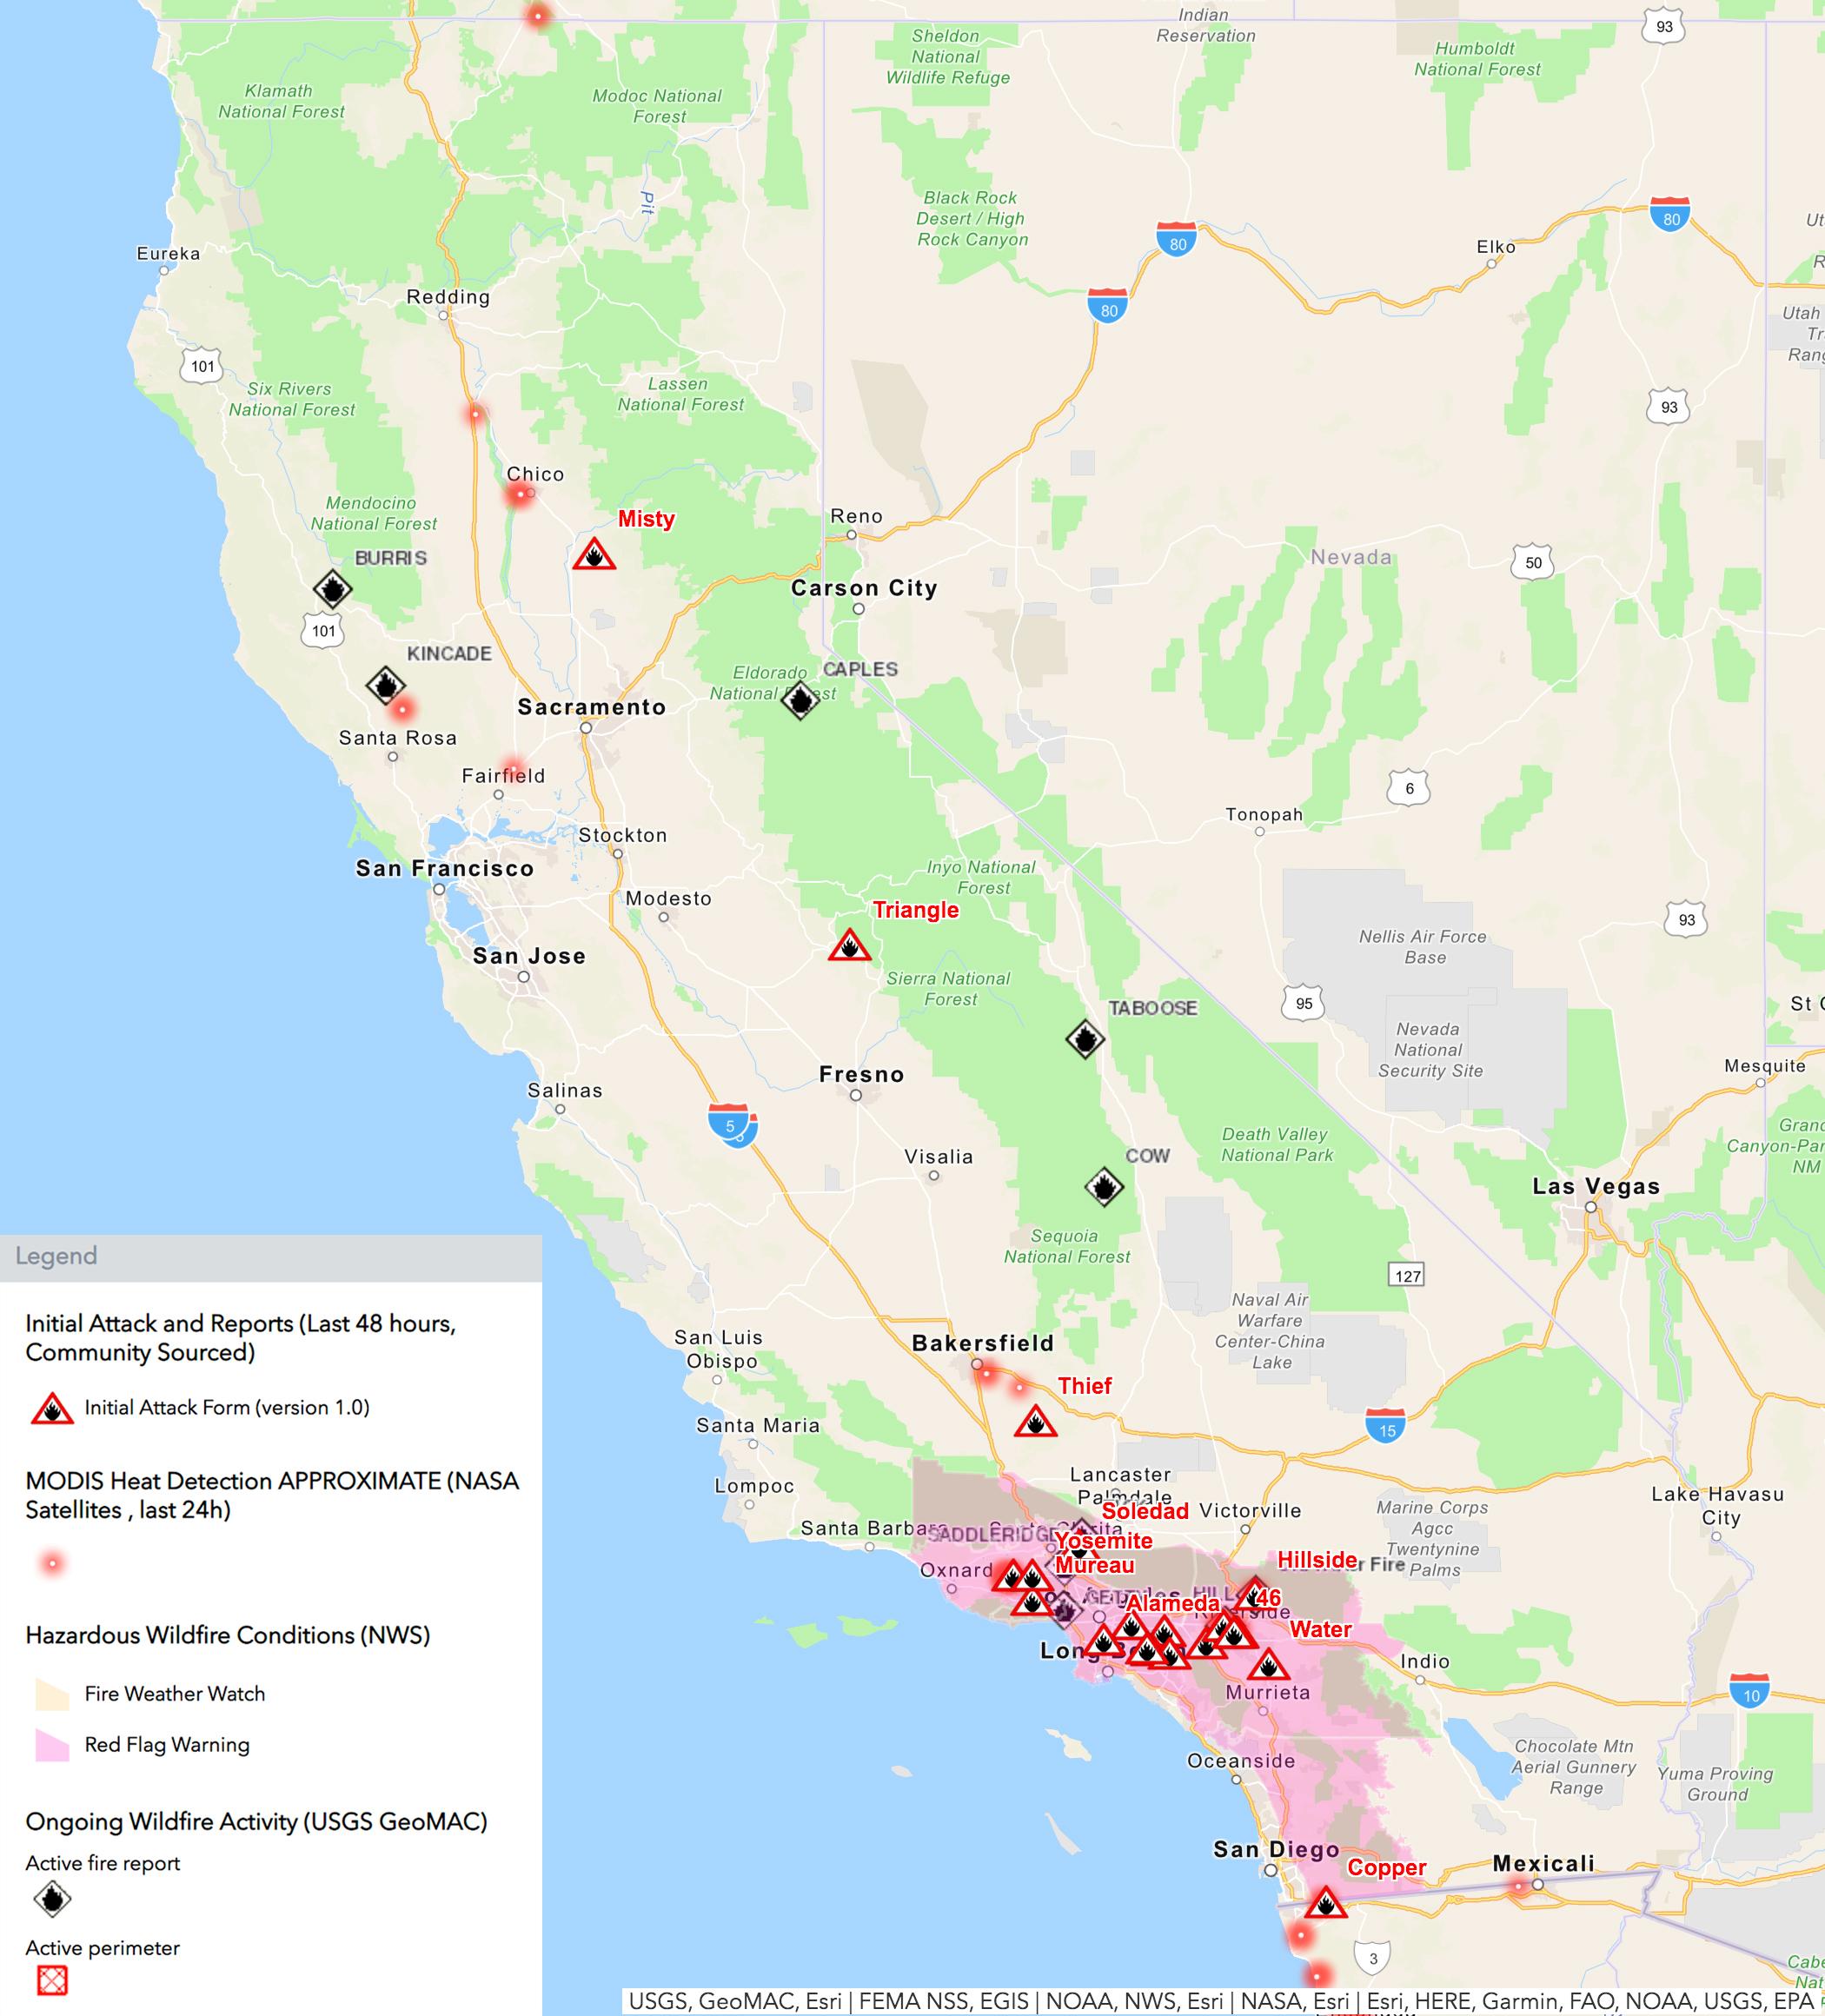 California Active Fire Map California Fire Map: Easy Fire, Getty Fire, Hill Fire, Fullerton